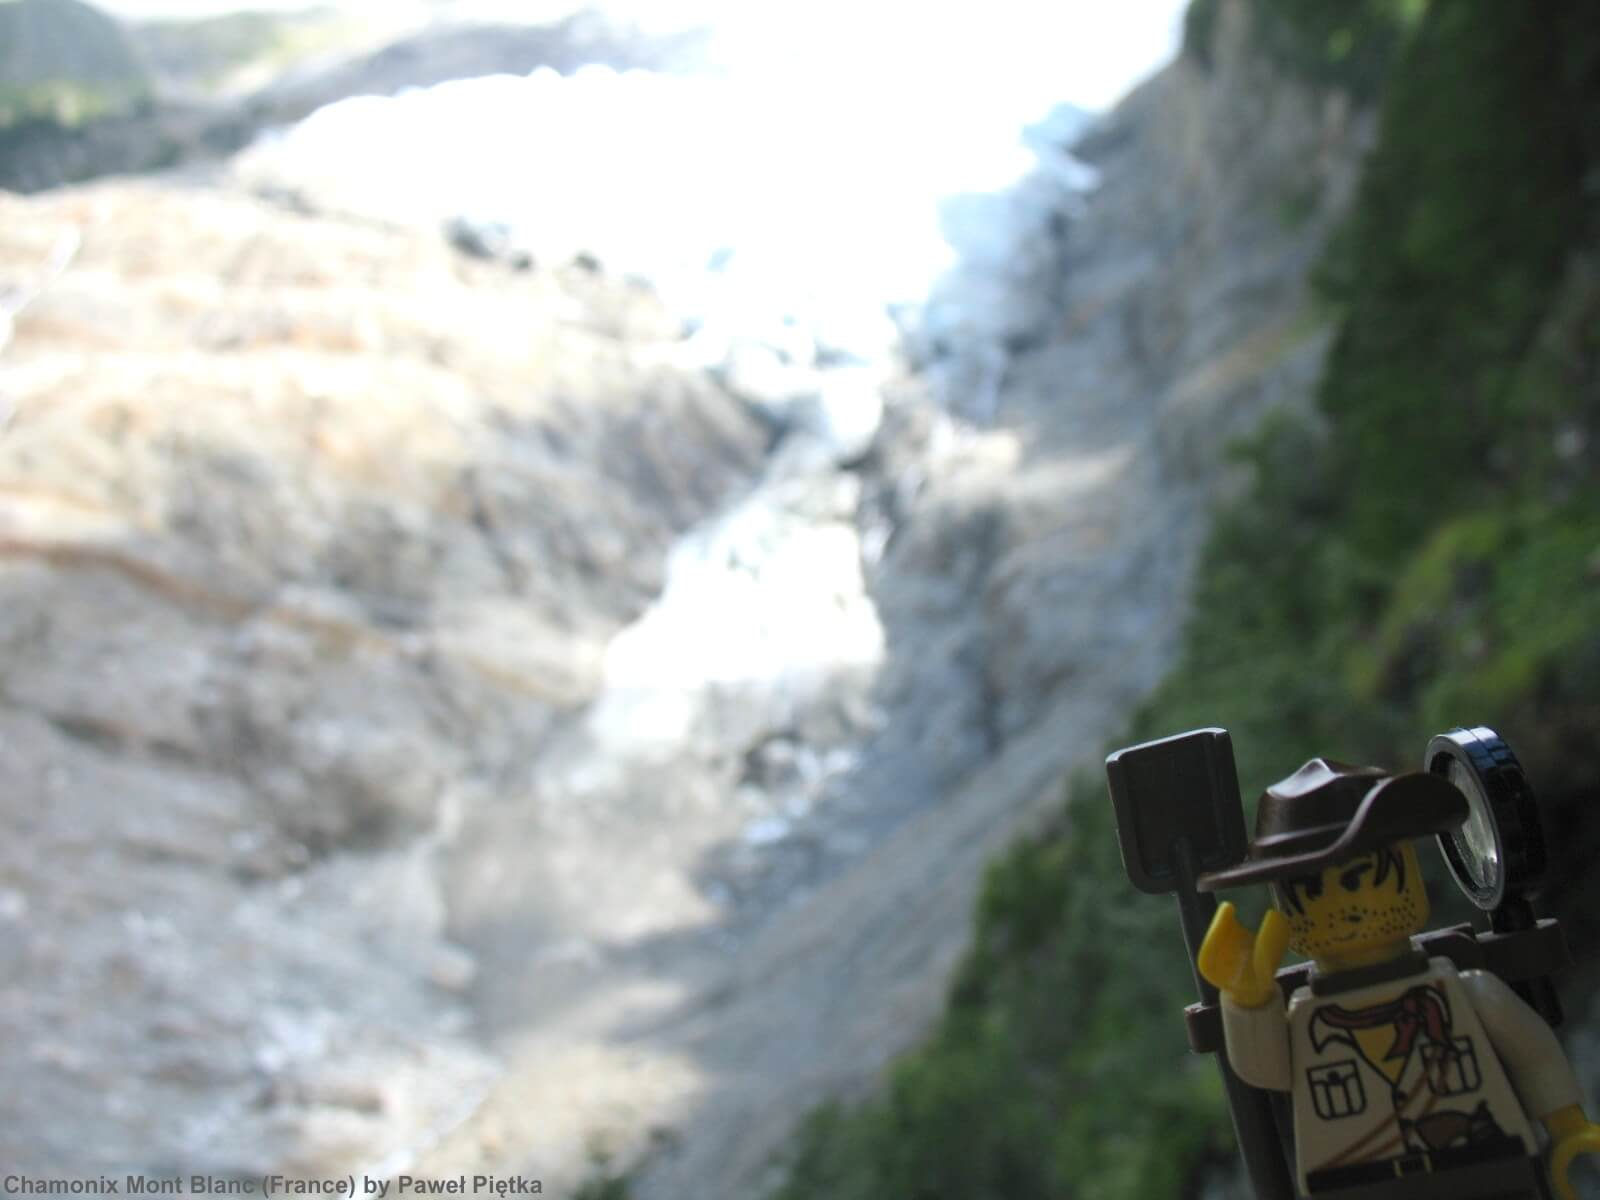 Chamonix Mont Blanc (France) 5